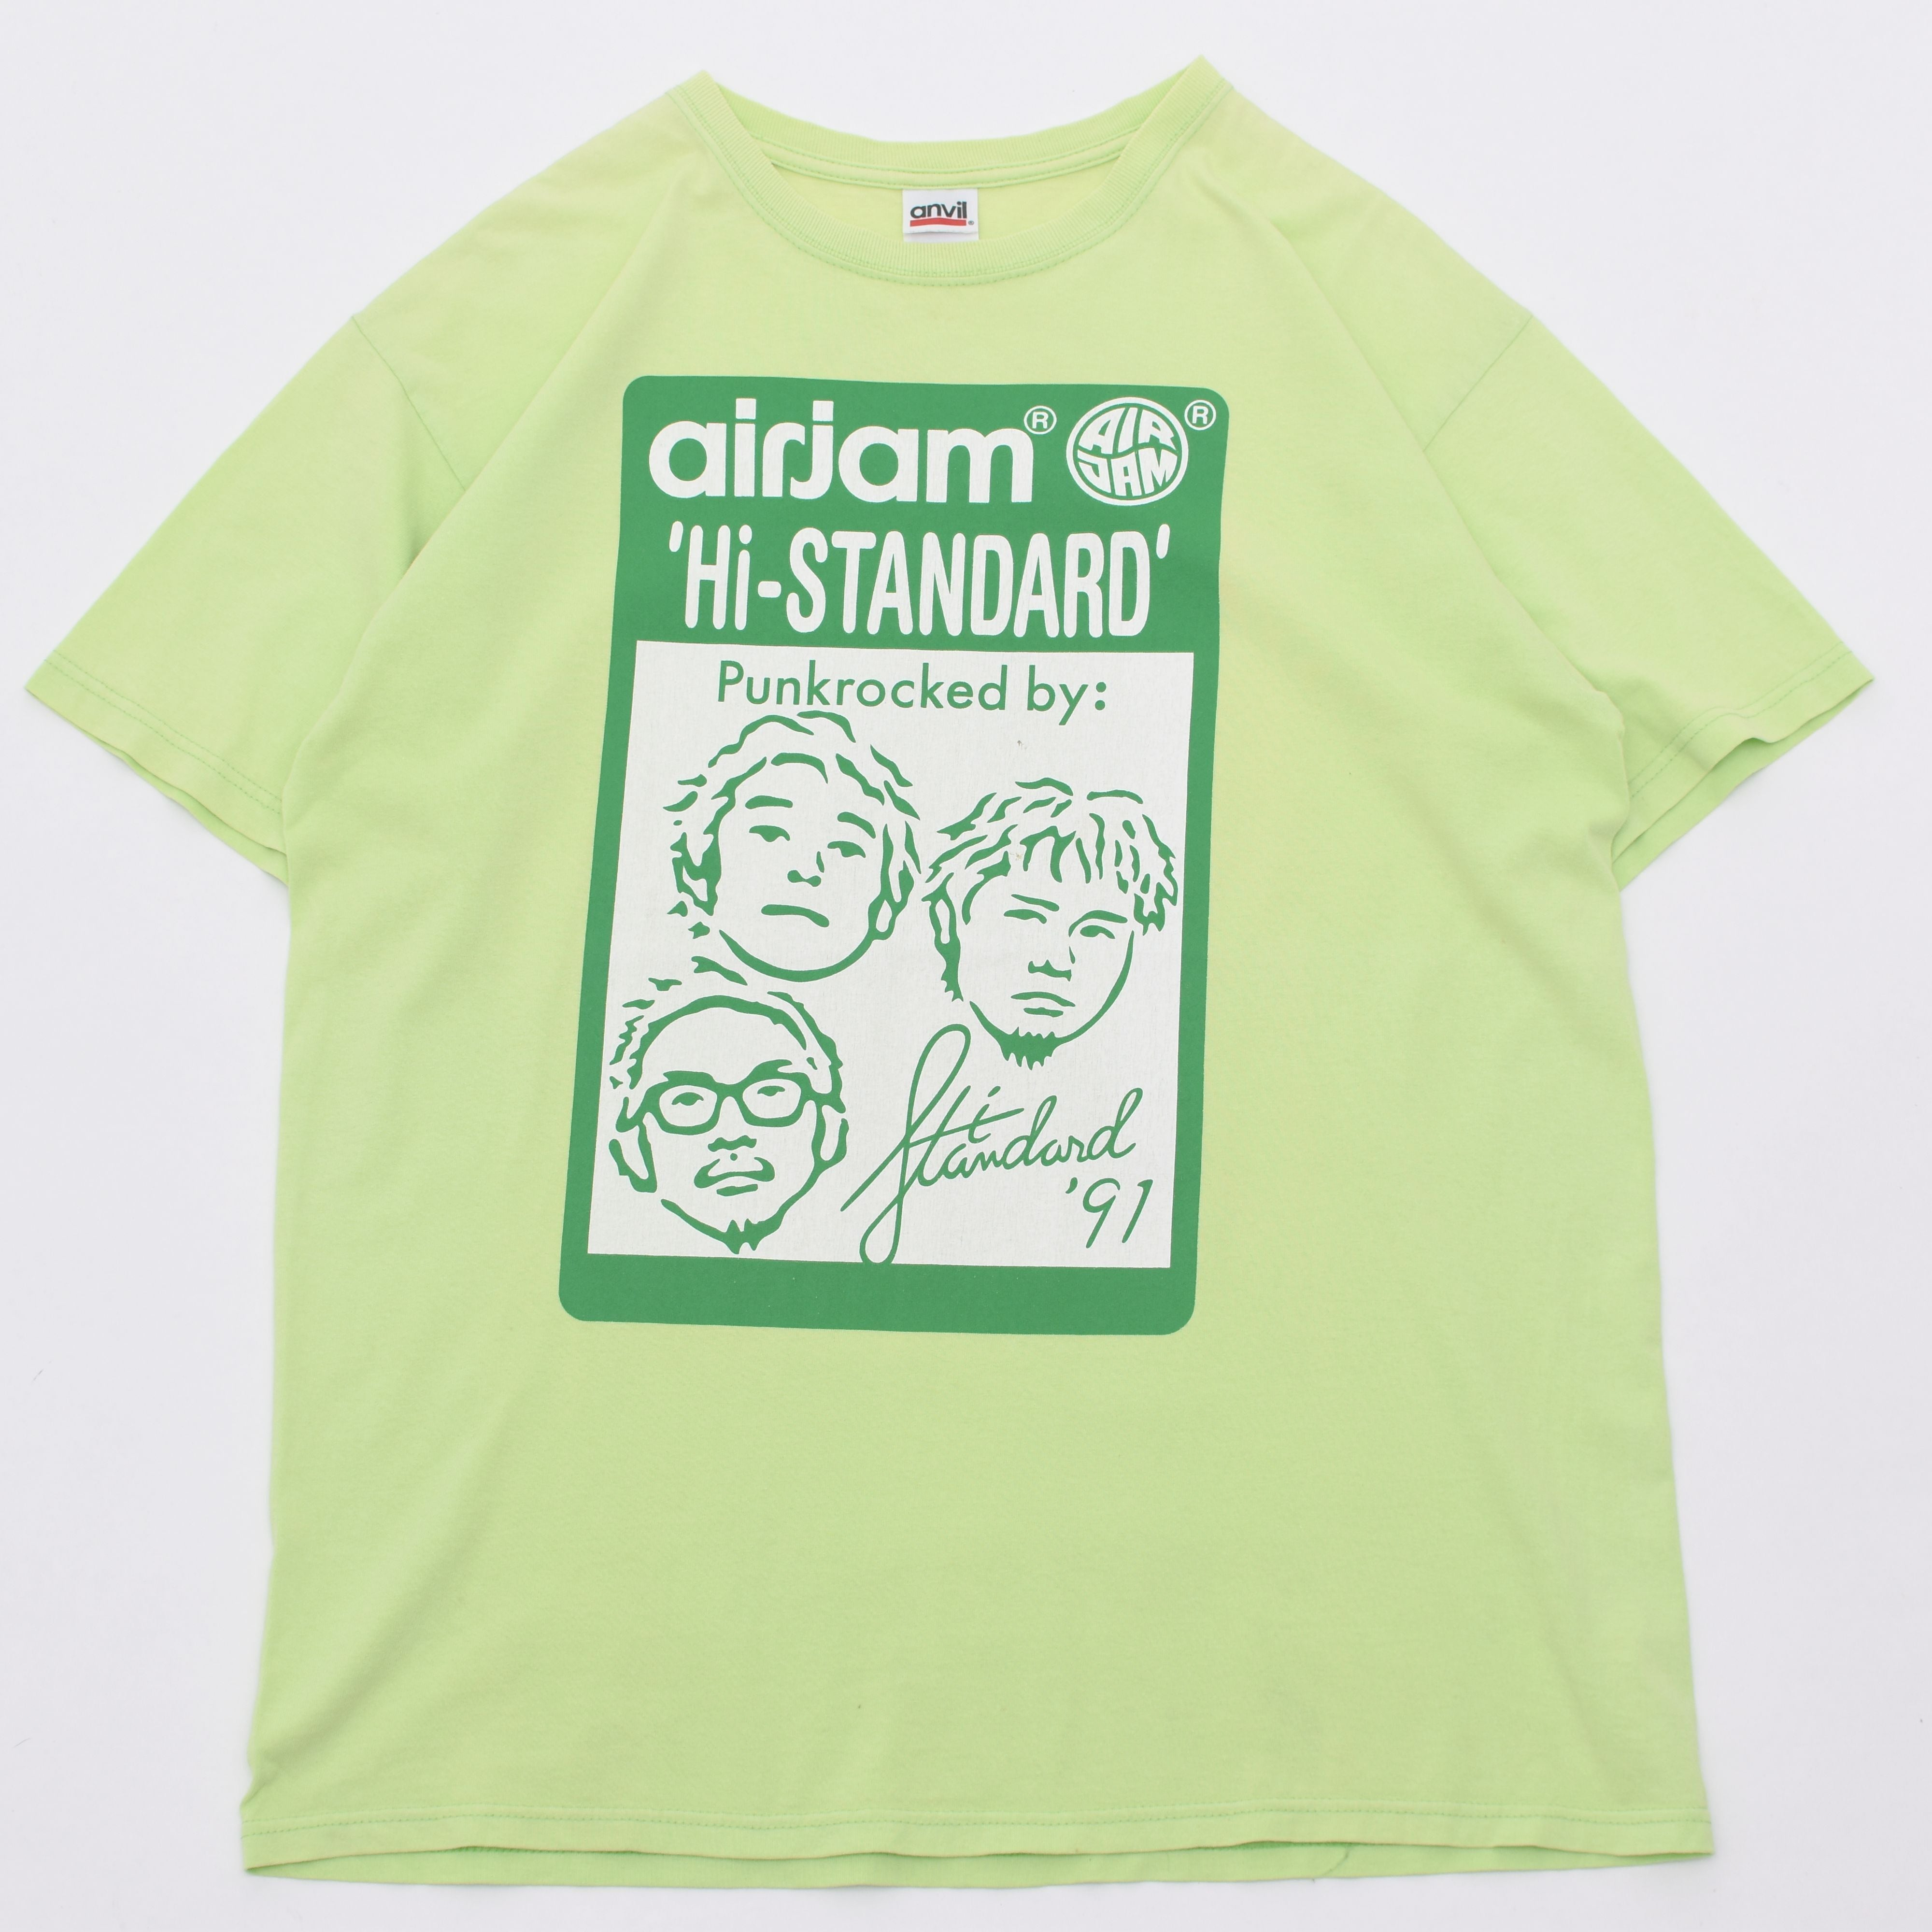 airjam Hi-STANDARD print T shirt バンドTシャツ